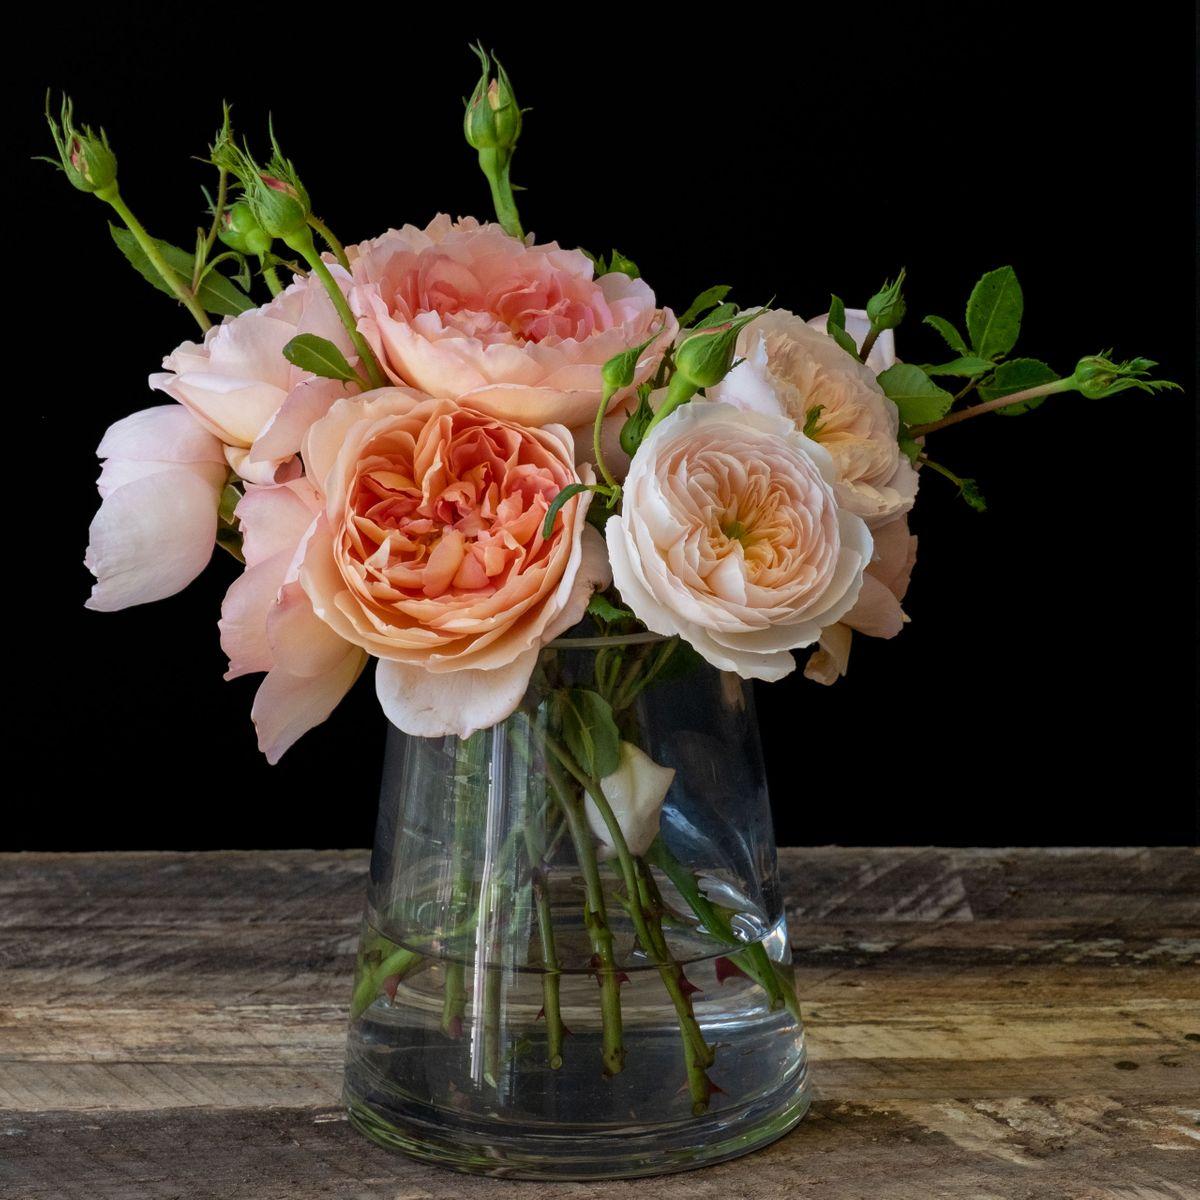 Roses_LB_03.jpg